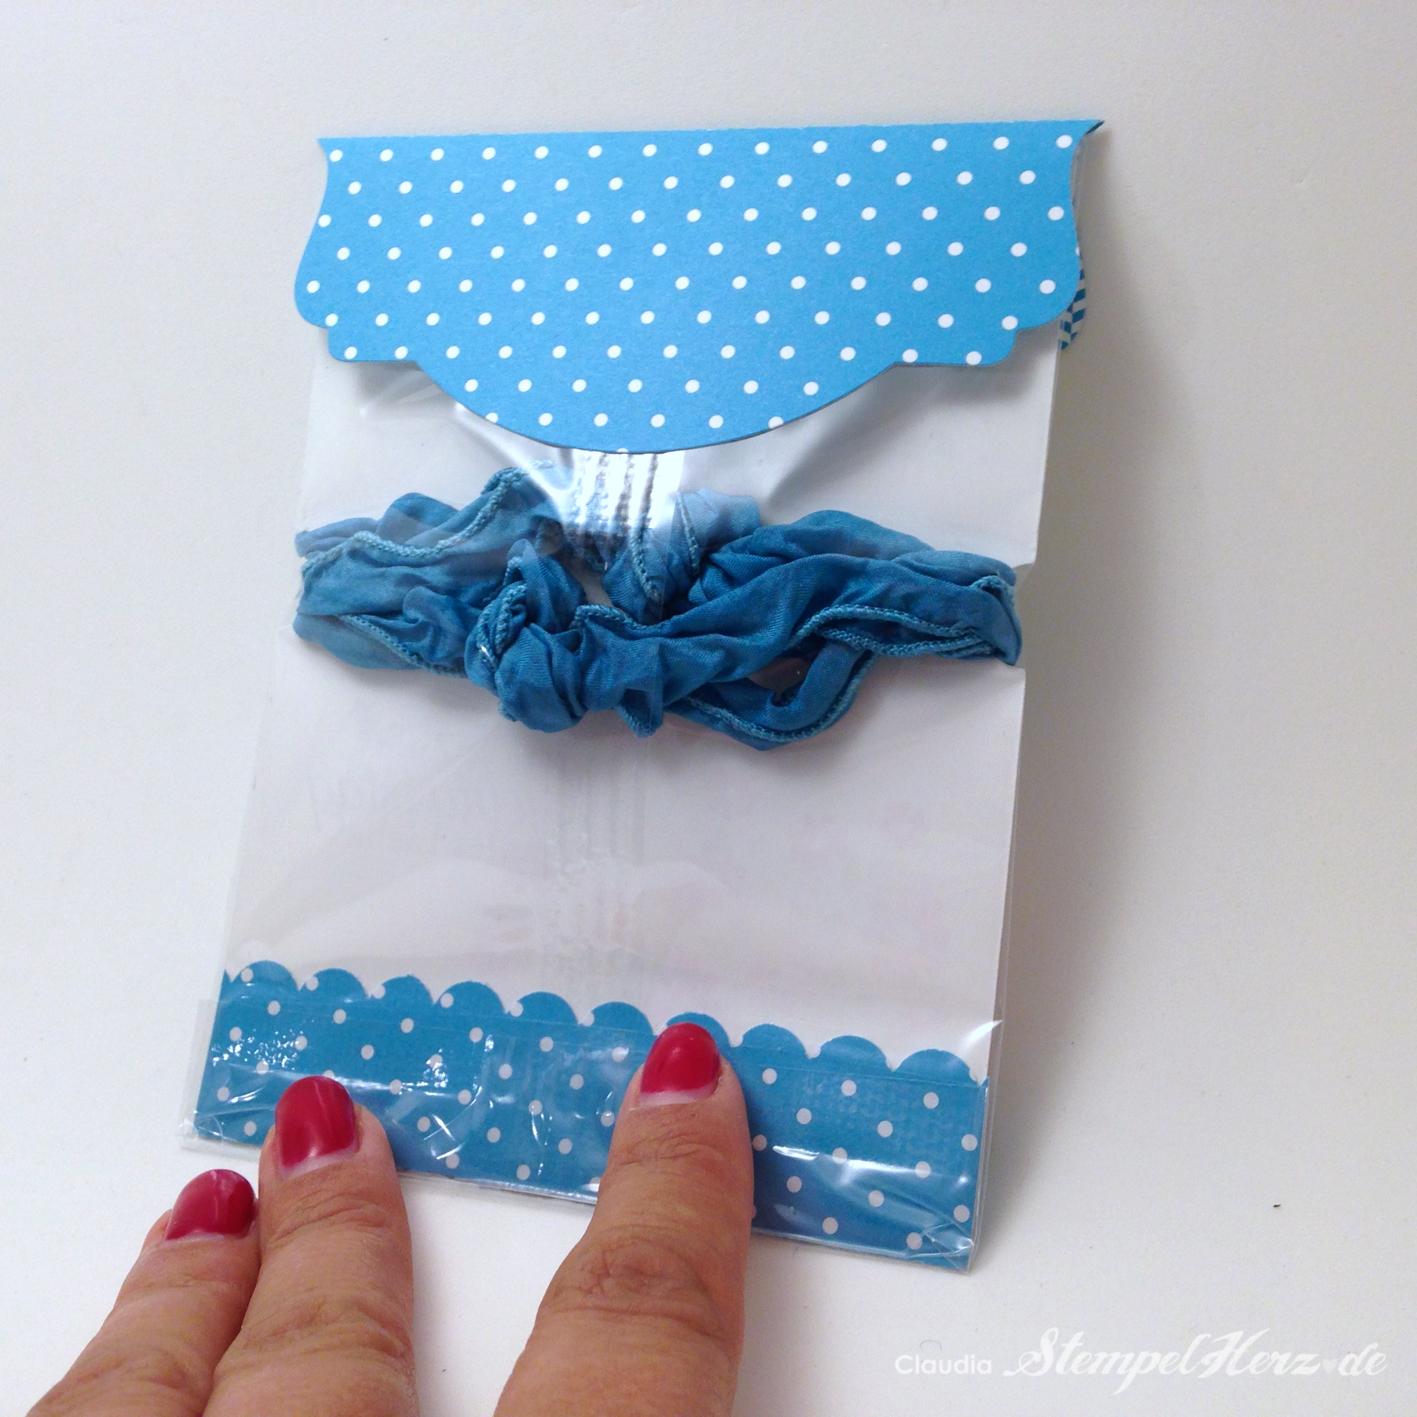 Stampin Up – Stempelherz – Schmuckverpackung – Armband – Geschenk – Glas Cabochon – Naturnah – Schmuckverpackung Wickelarmband 0d